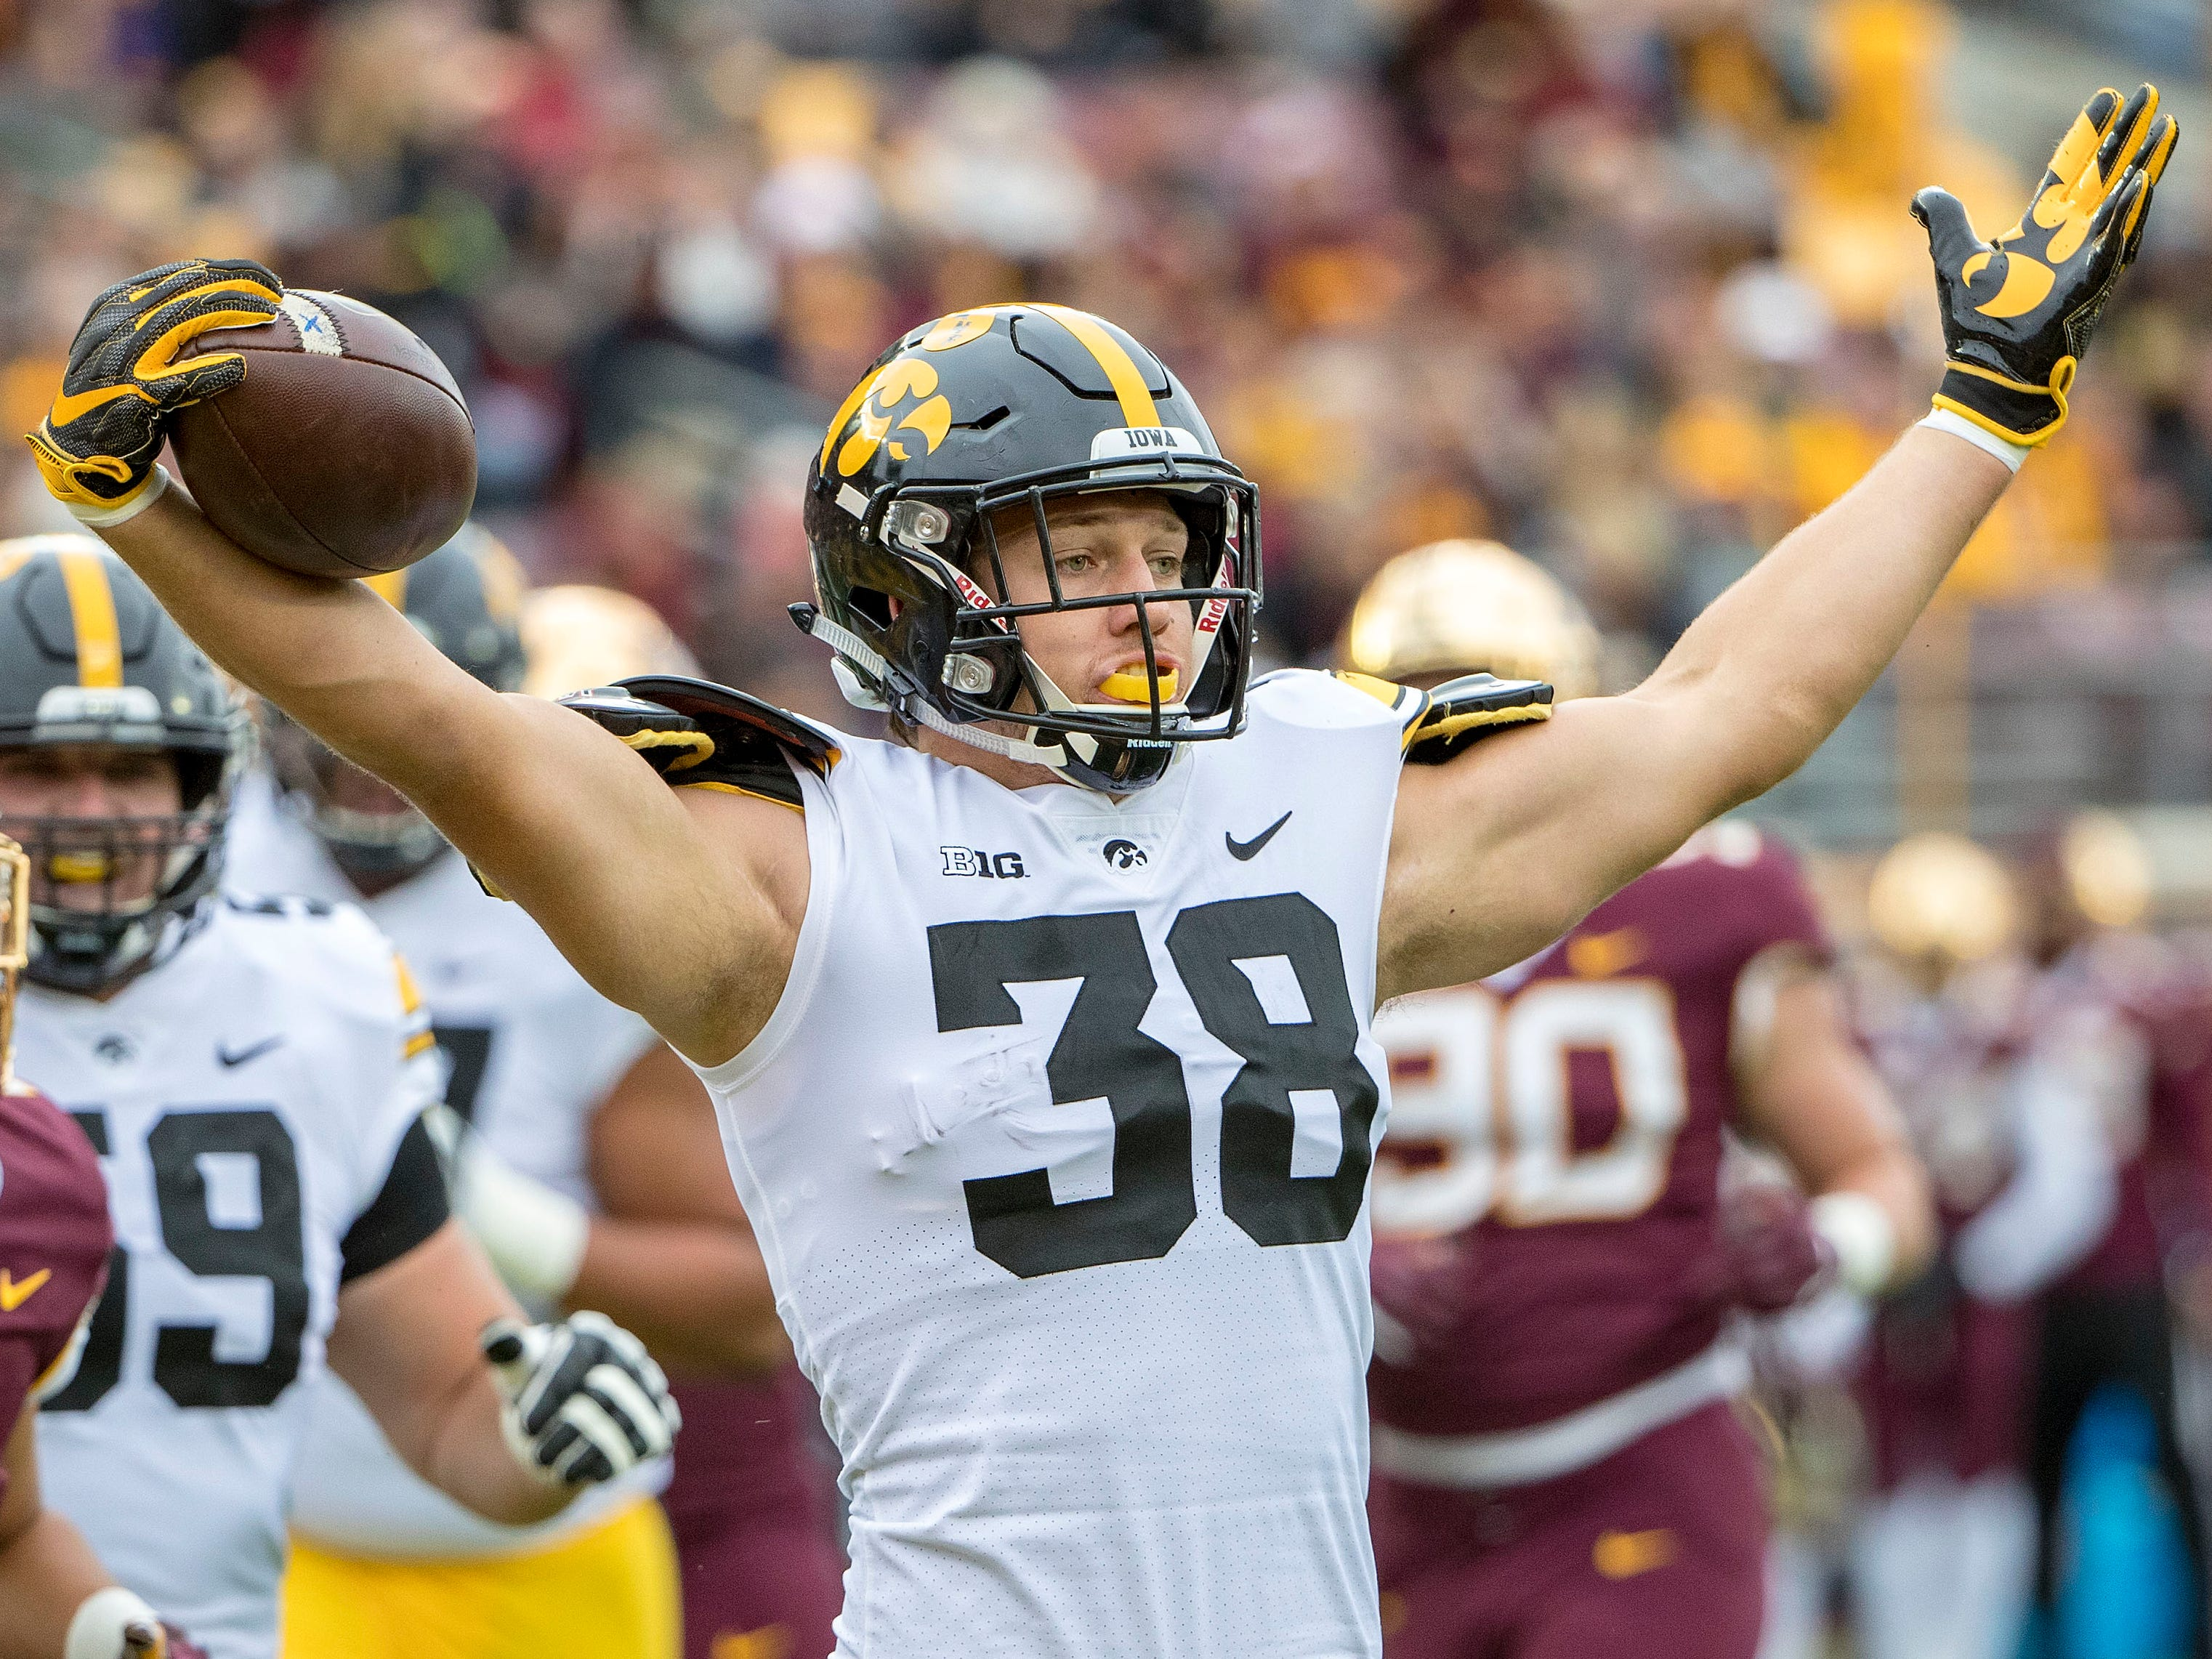 20.Pittsburgh Steelers— T.J. Hockenson, TE, Iowa